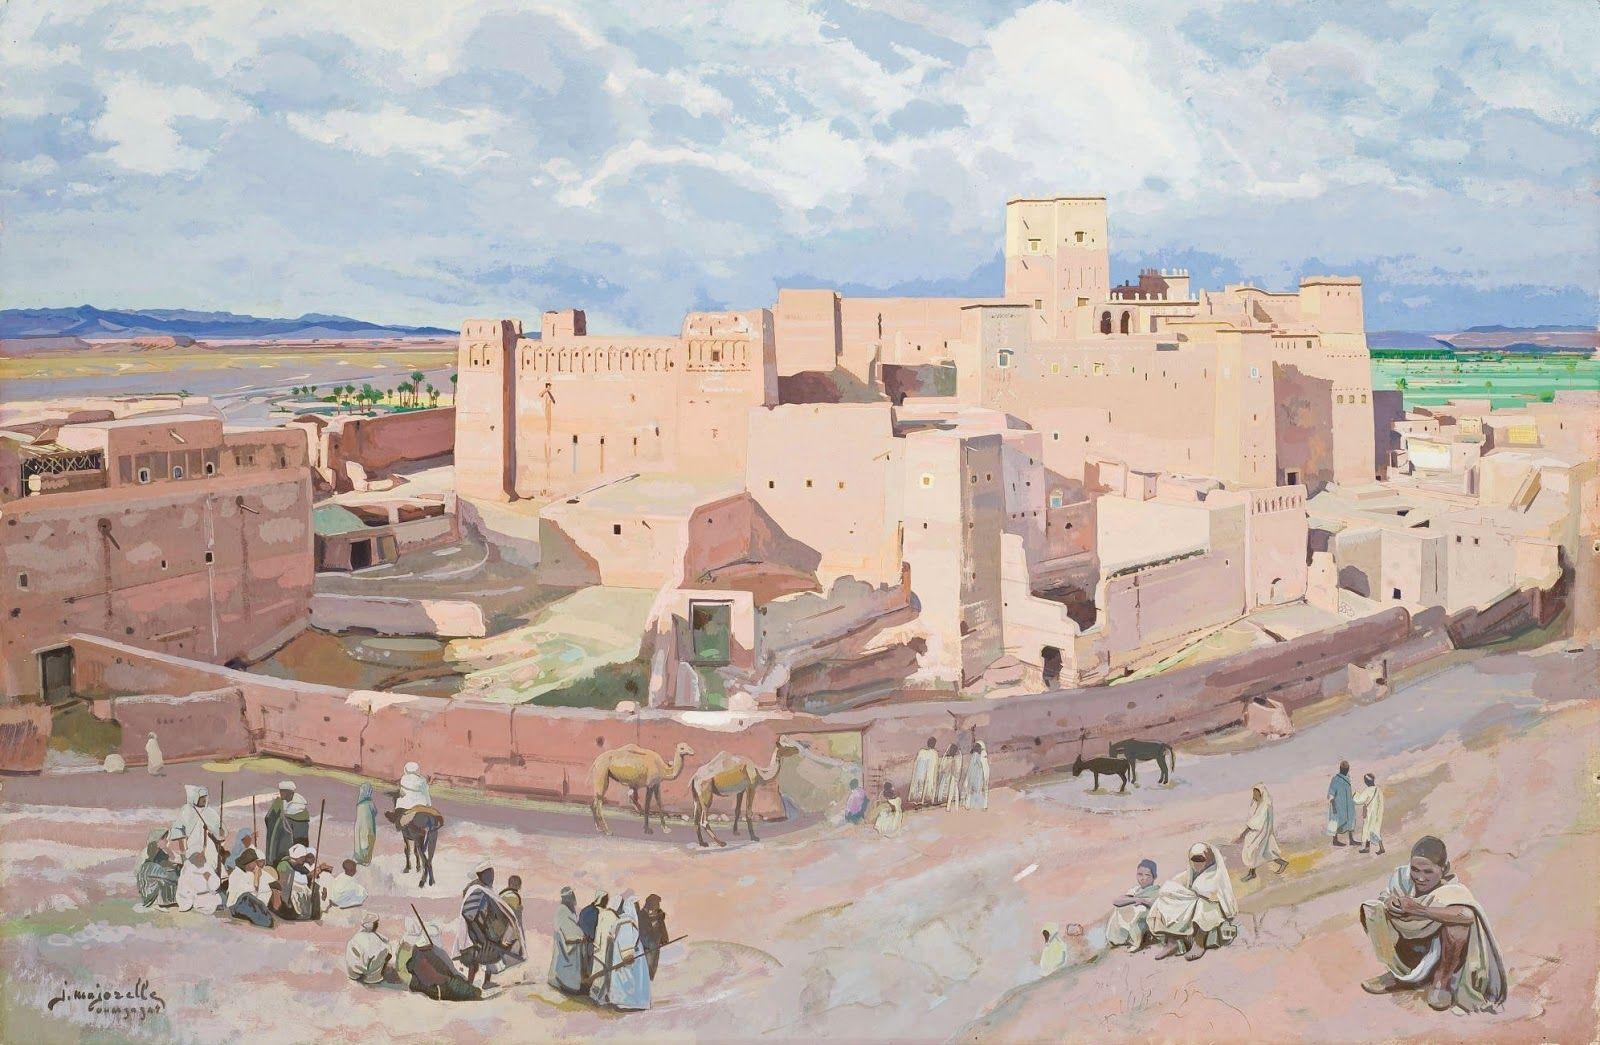 Jacques Majorelle - Ouarzazate